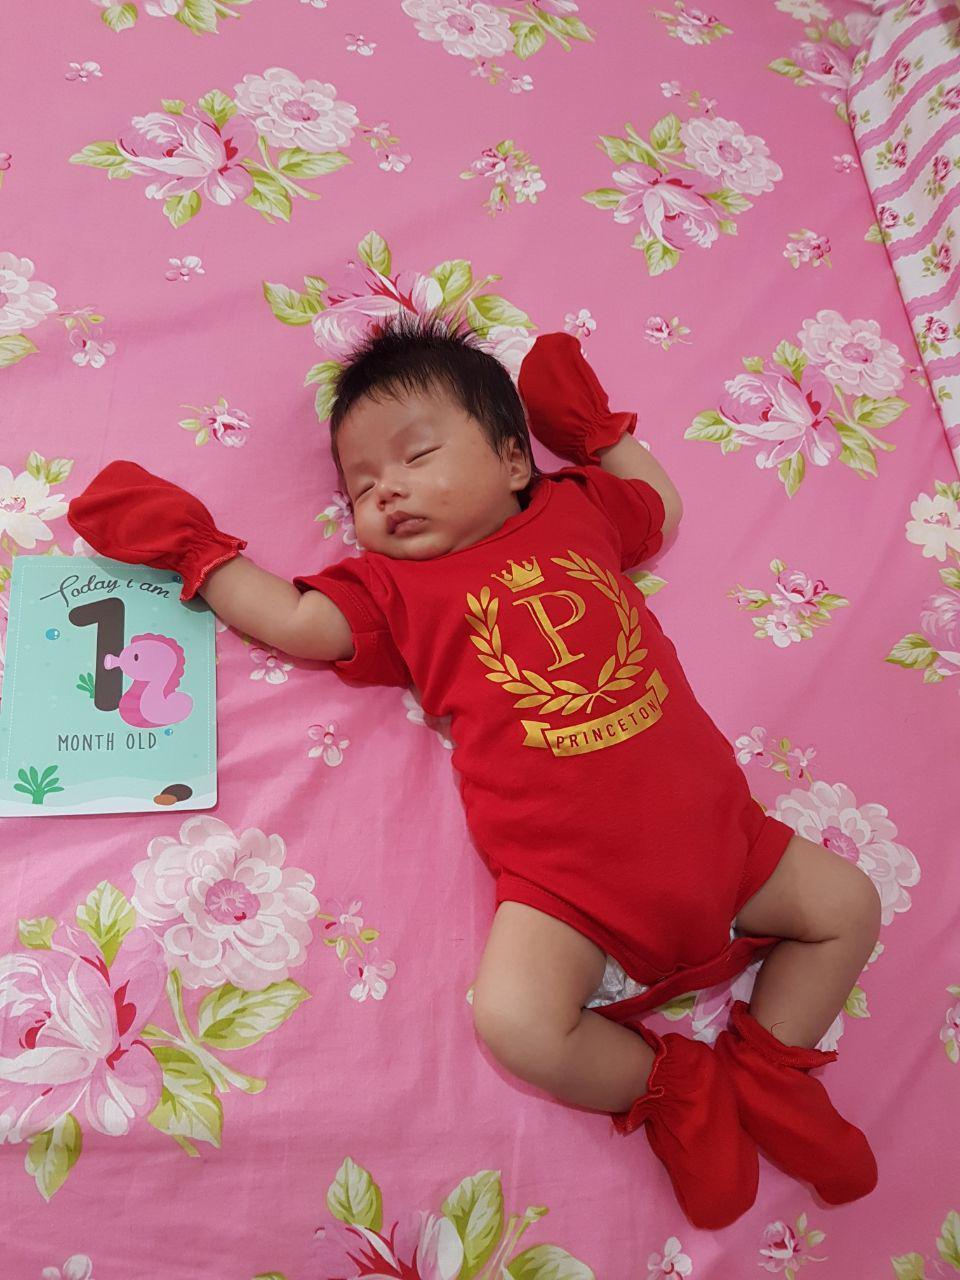 Tradisi Muaguek Manyue Baby One Month Celebration Michelearns